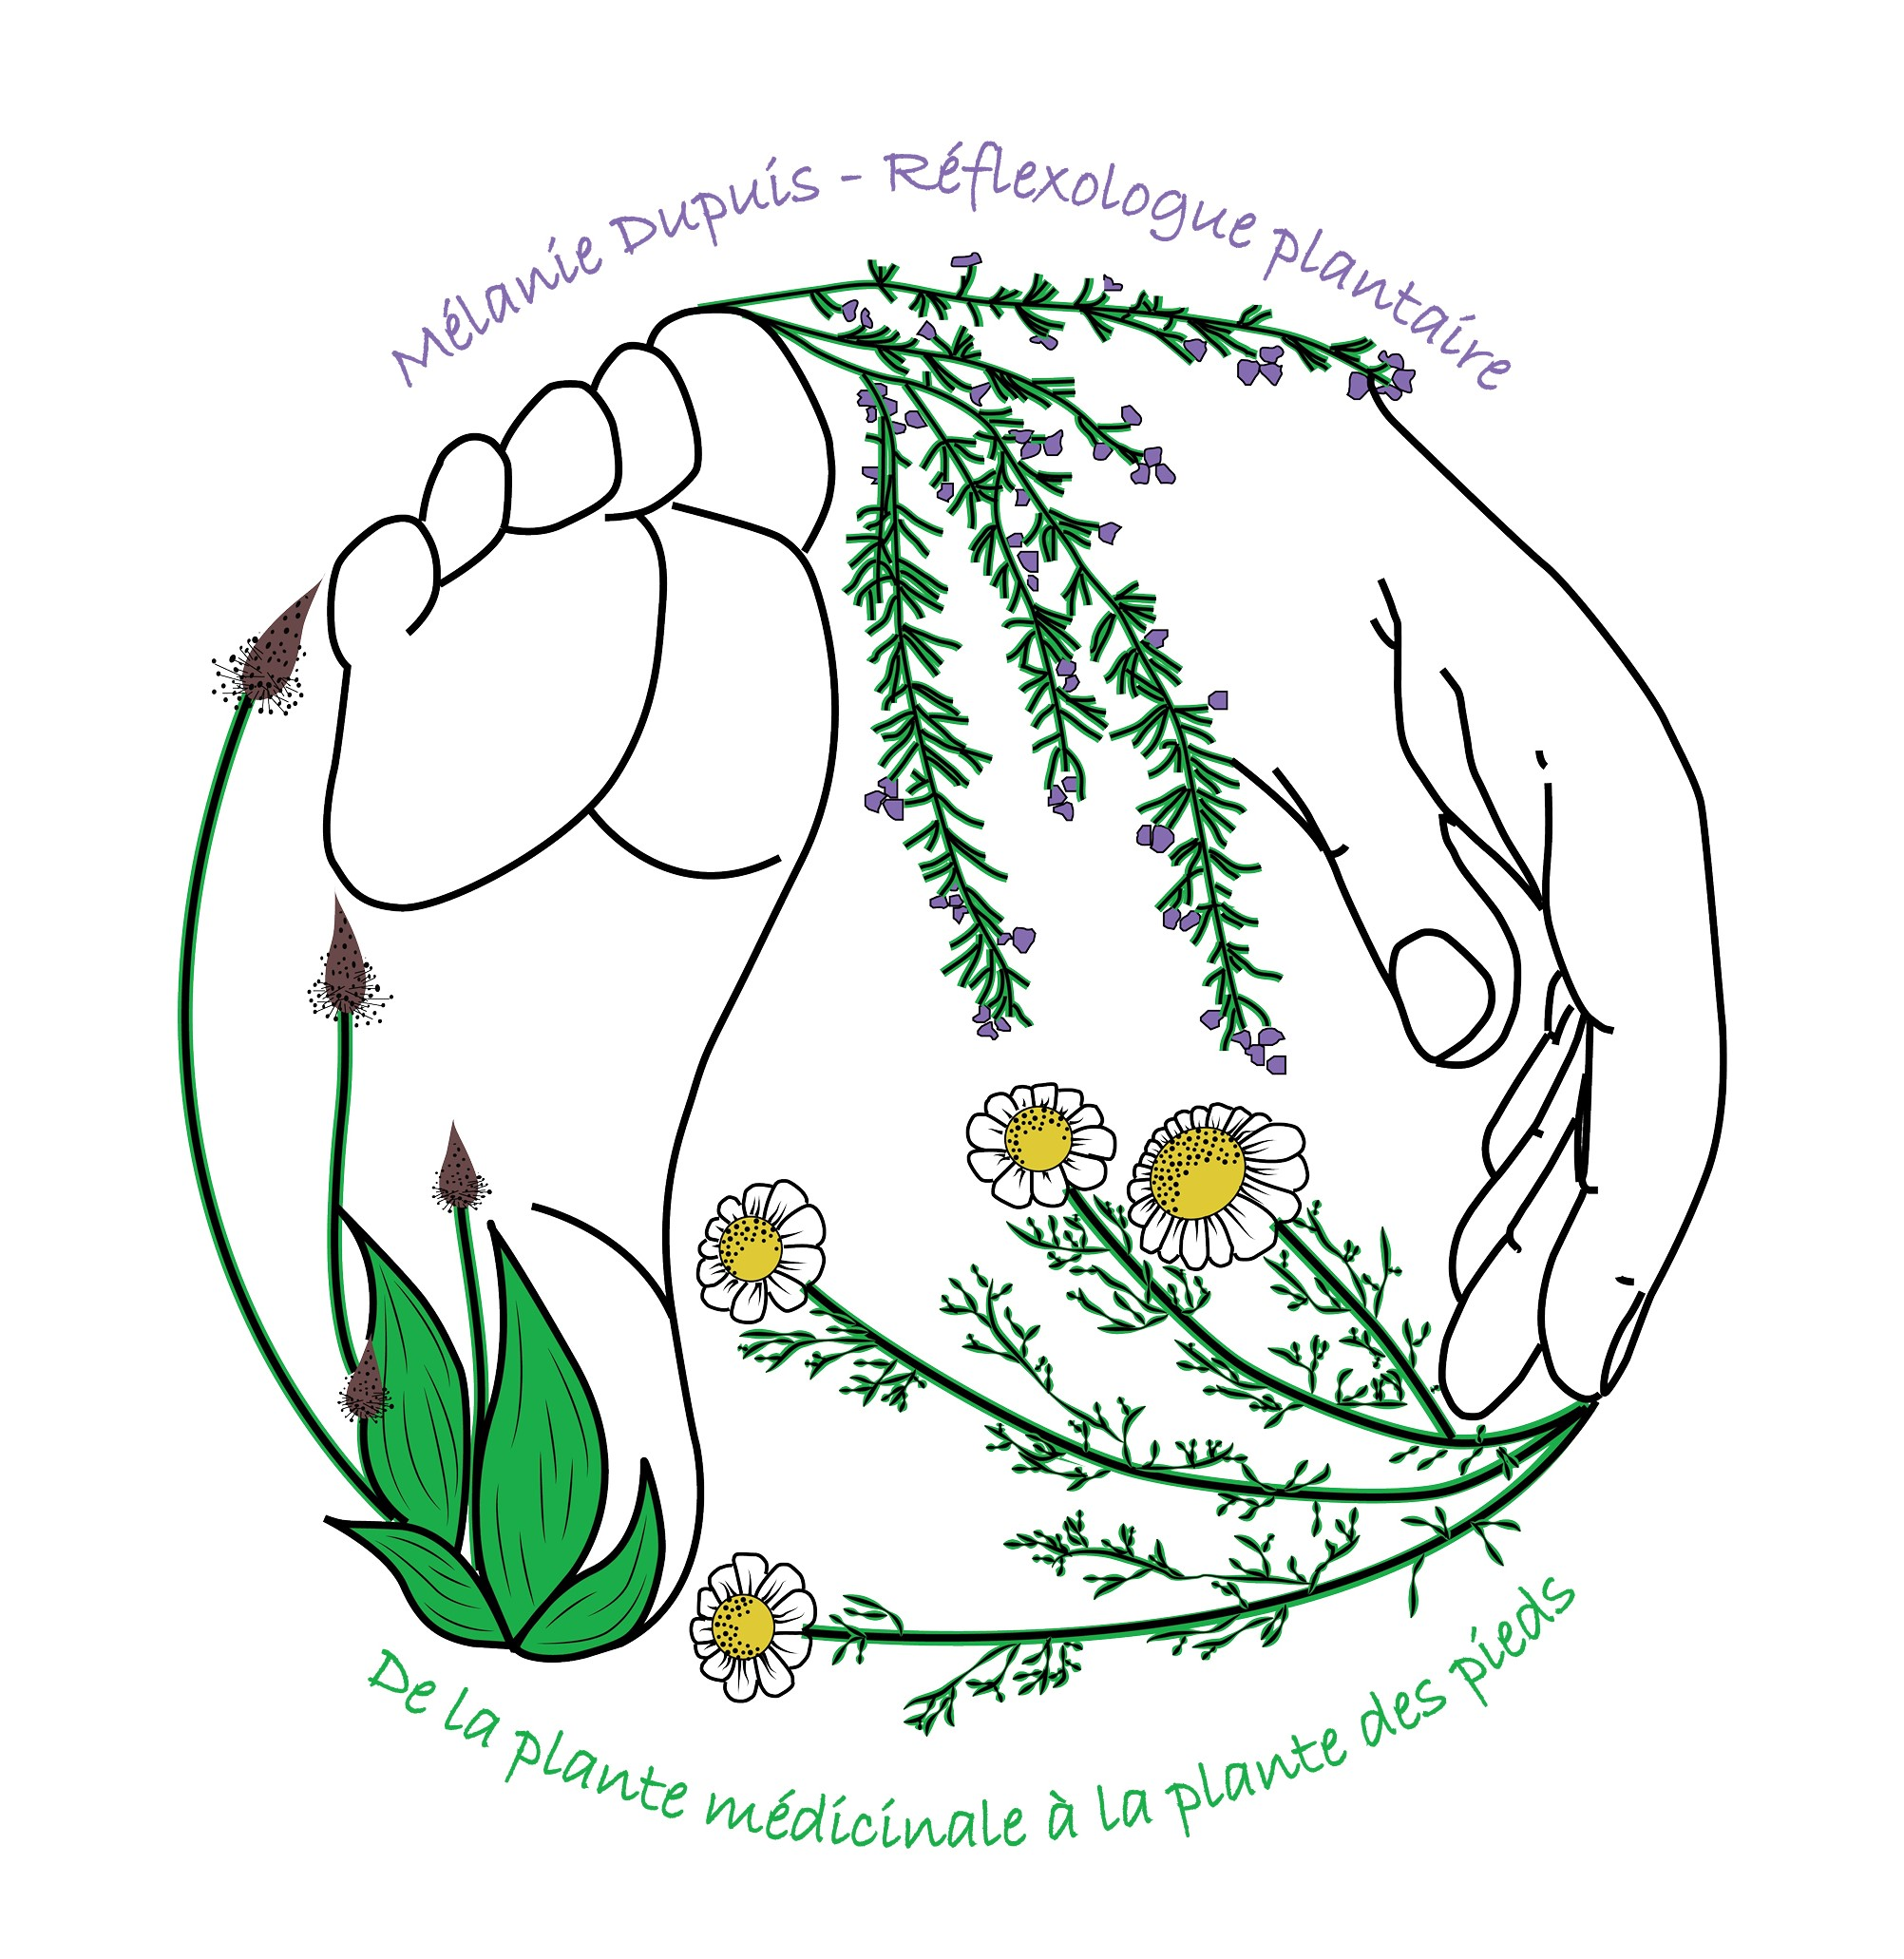 logo melanie dupuis - reflexologue plantaire - avec texte 2